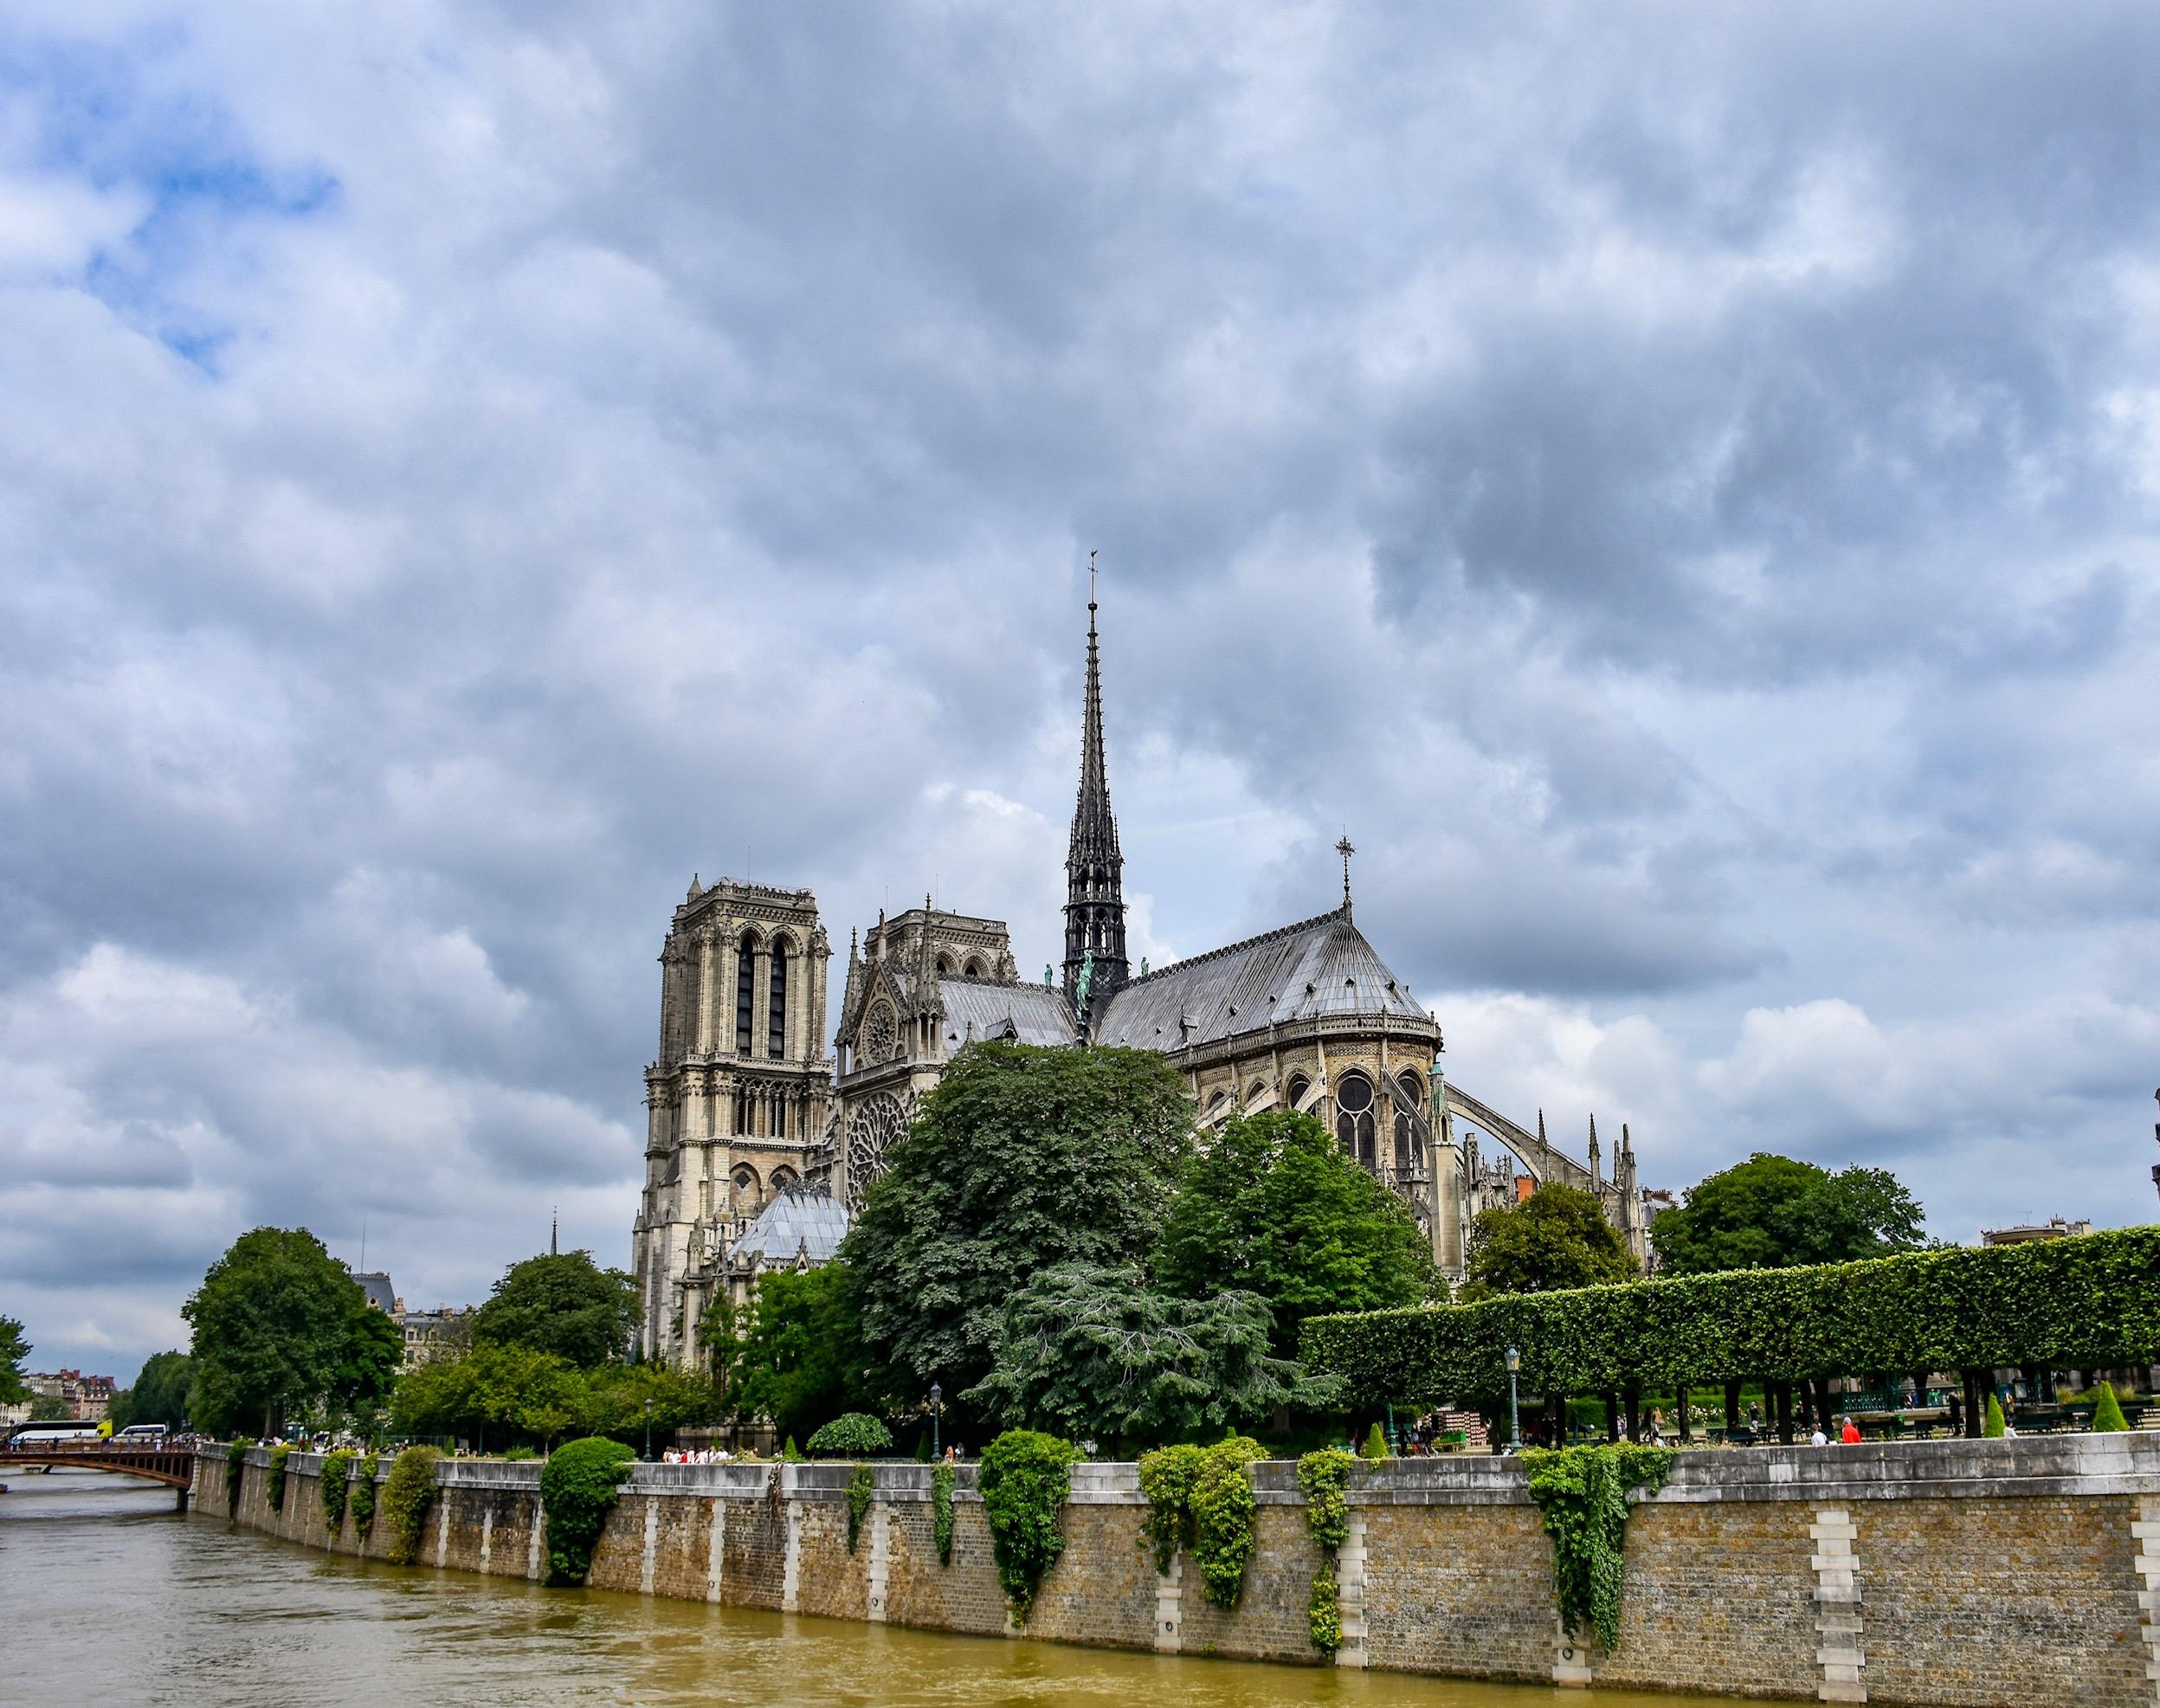 Notre Dame smaller